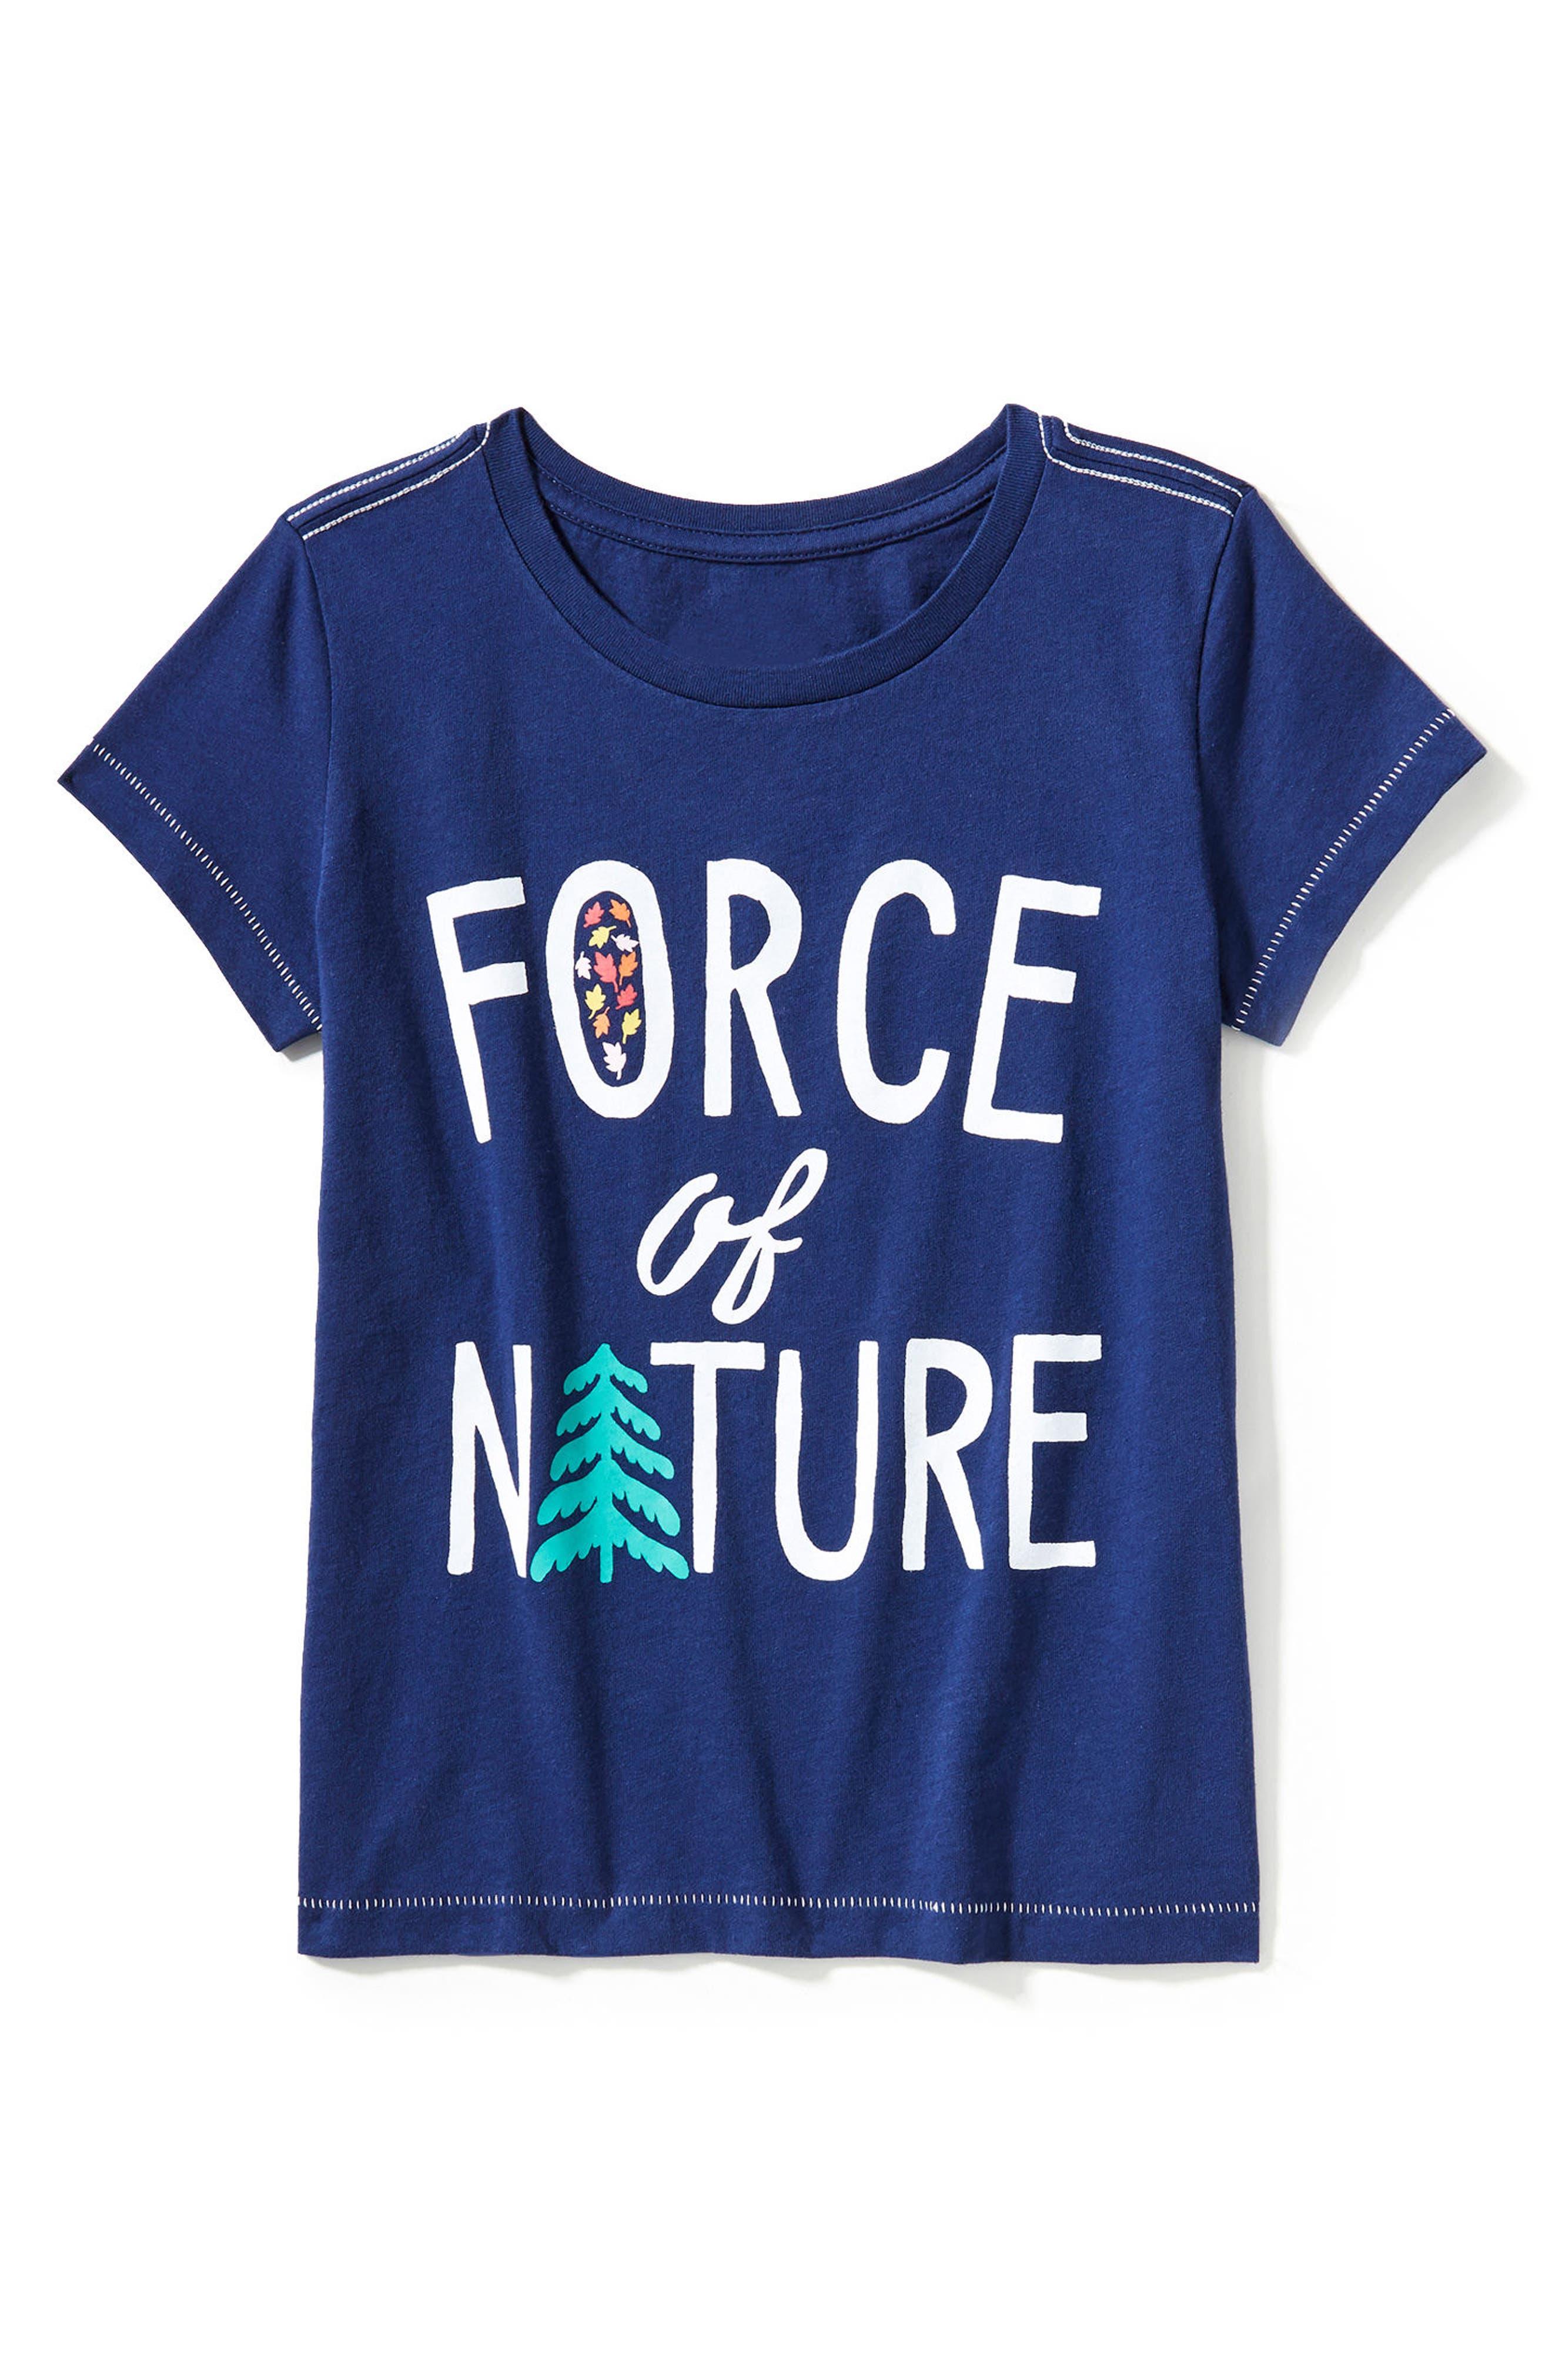 Main Image - Peek Force of Nature Graphic Tee (Toddler Girls, Little Girls & Big Girls)